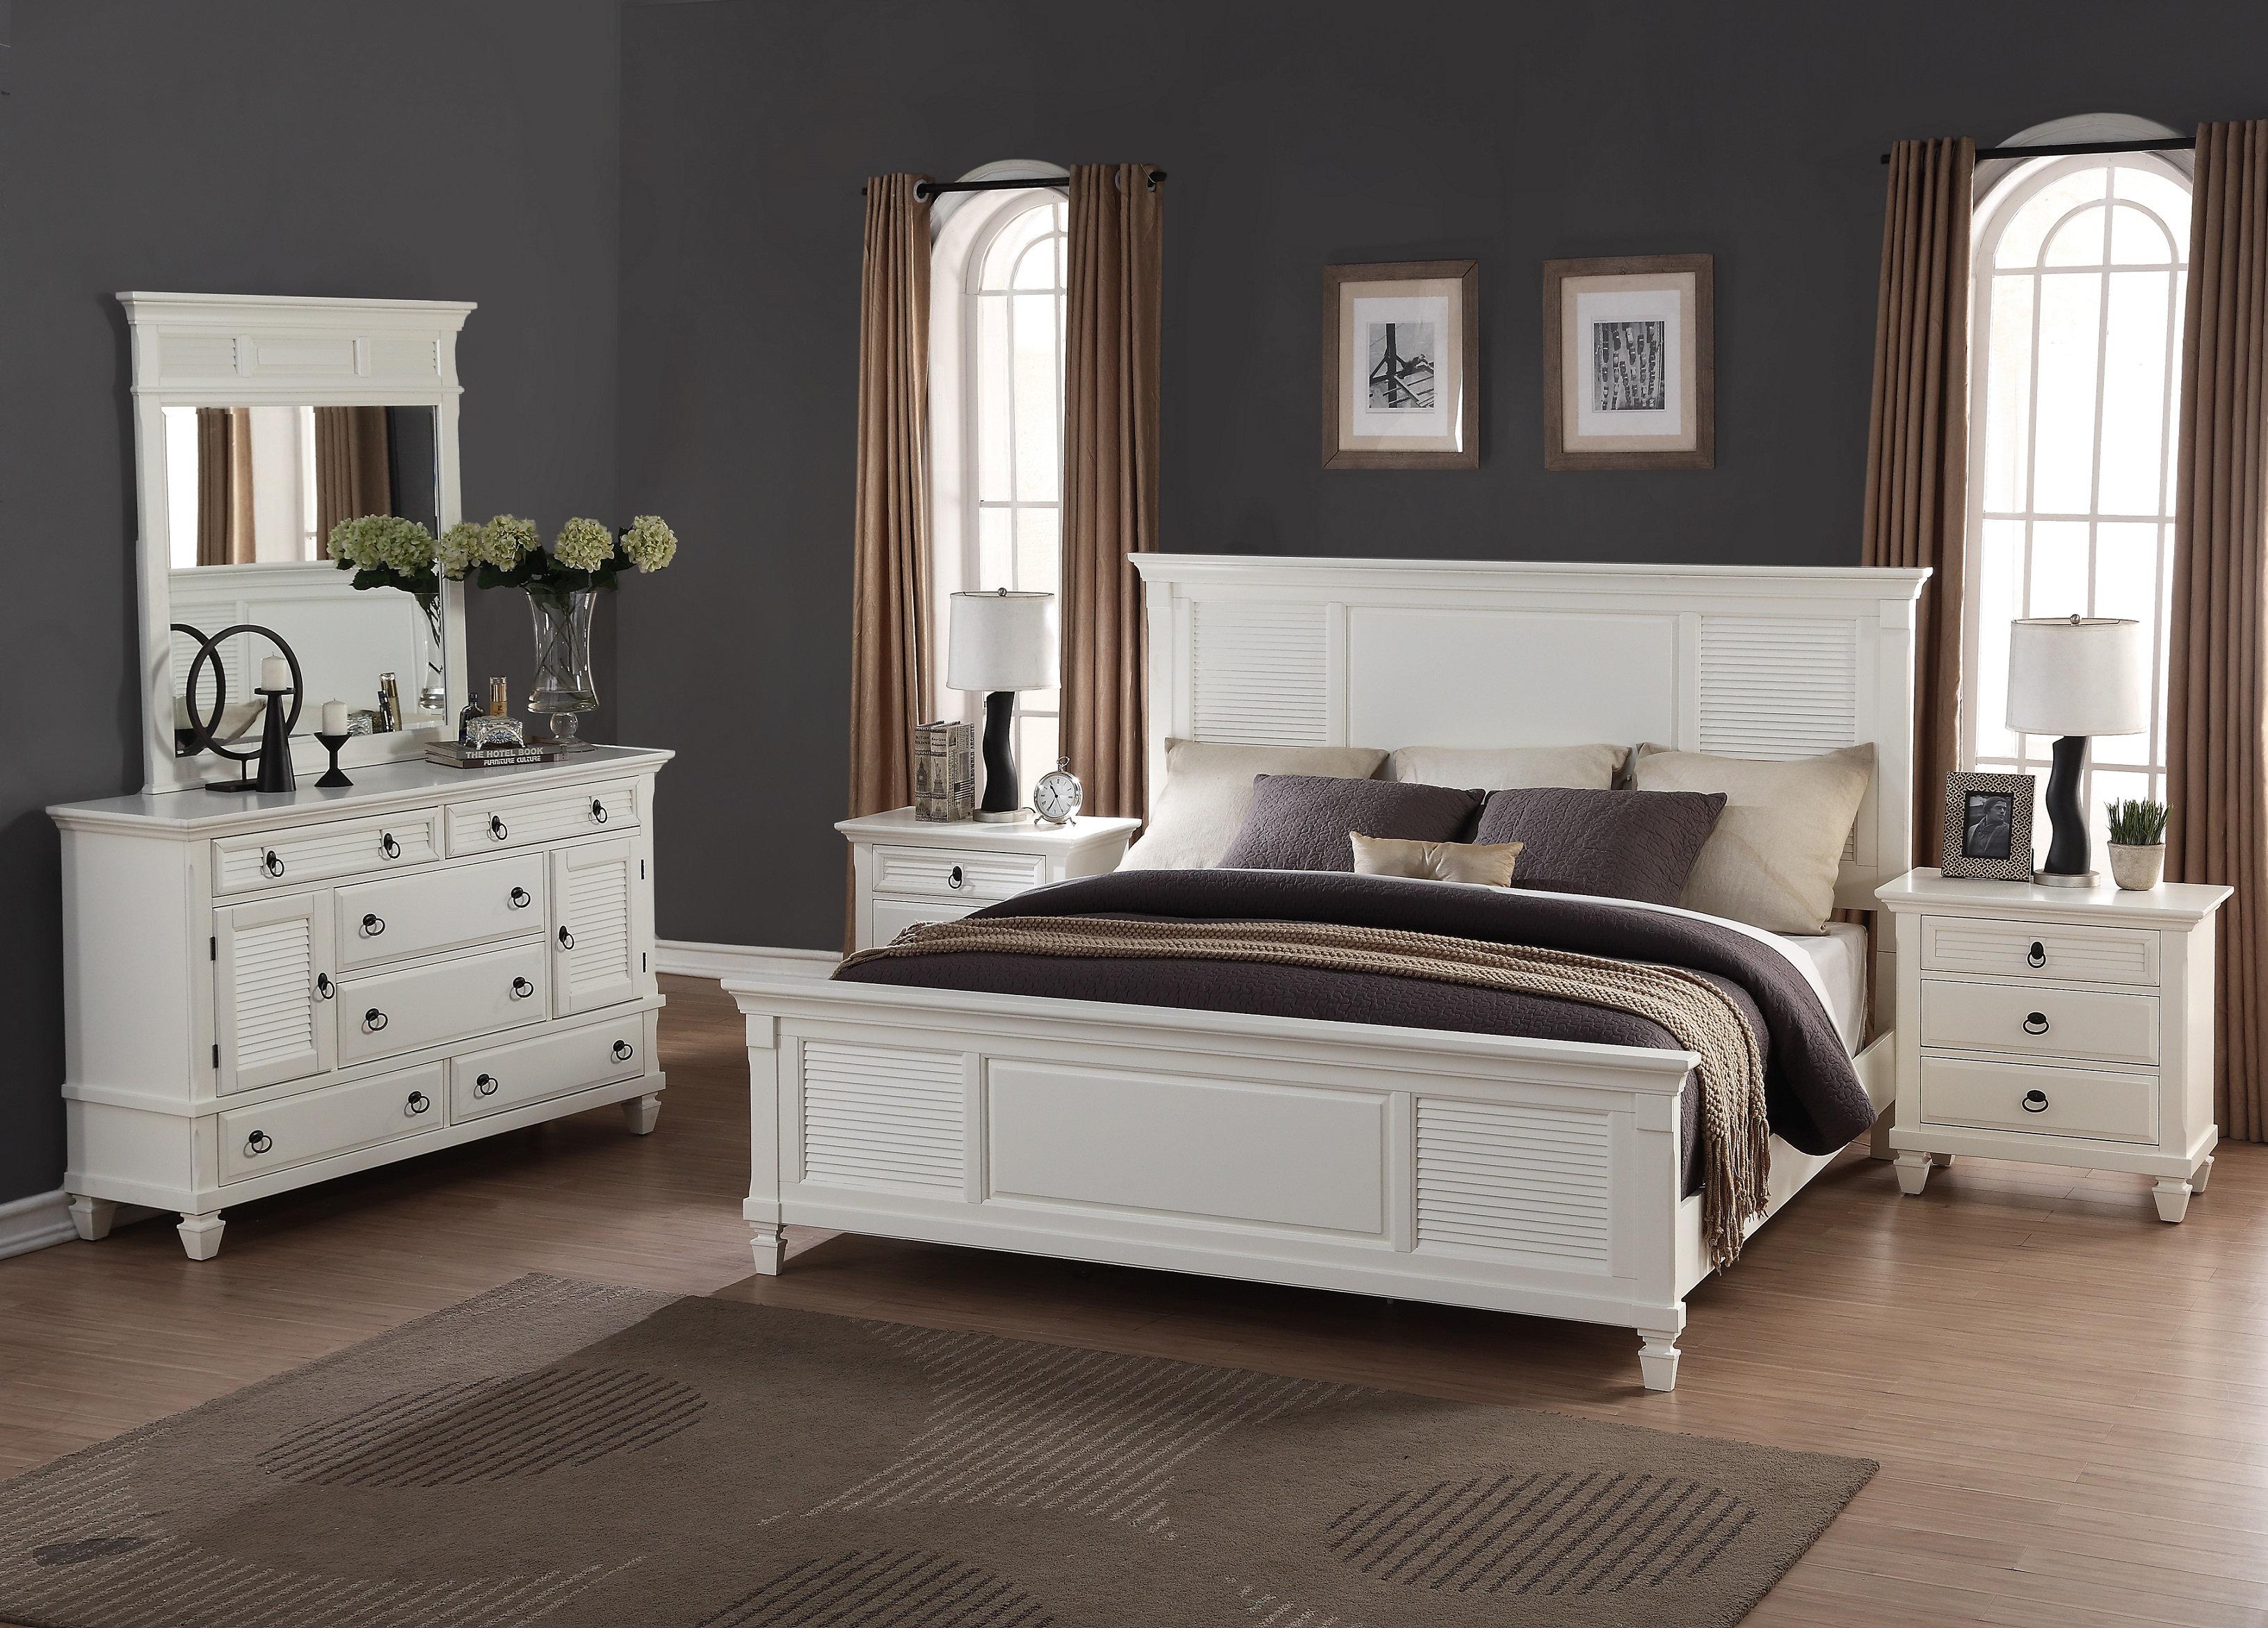 Perfect Roundhill Furniture Regitina King Platform 5 Piece Bedroom Set   Wayfair